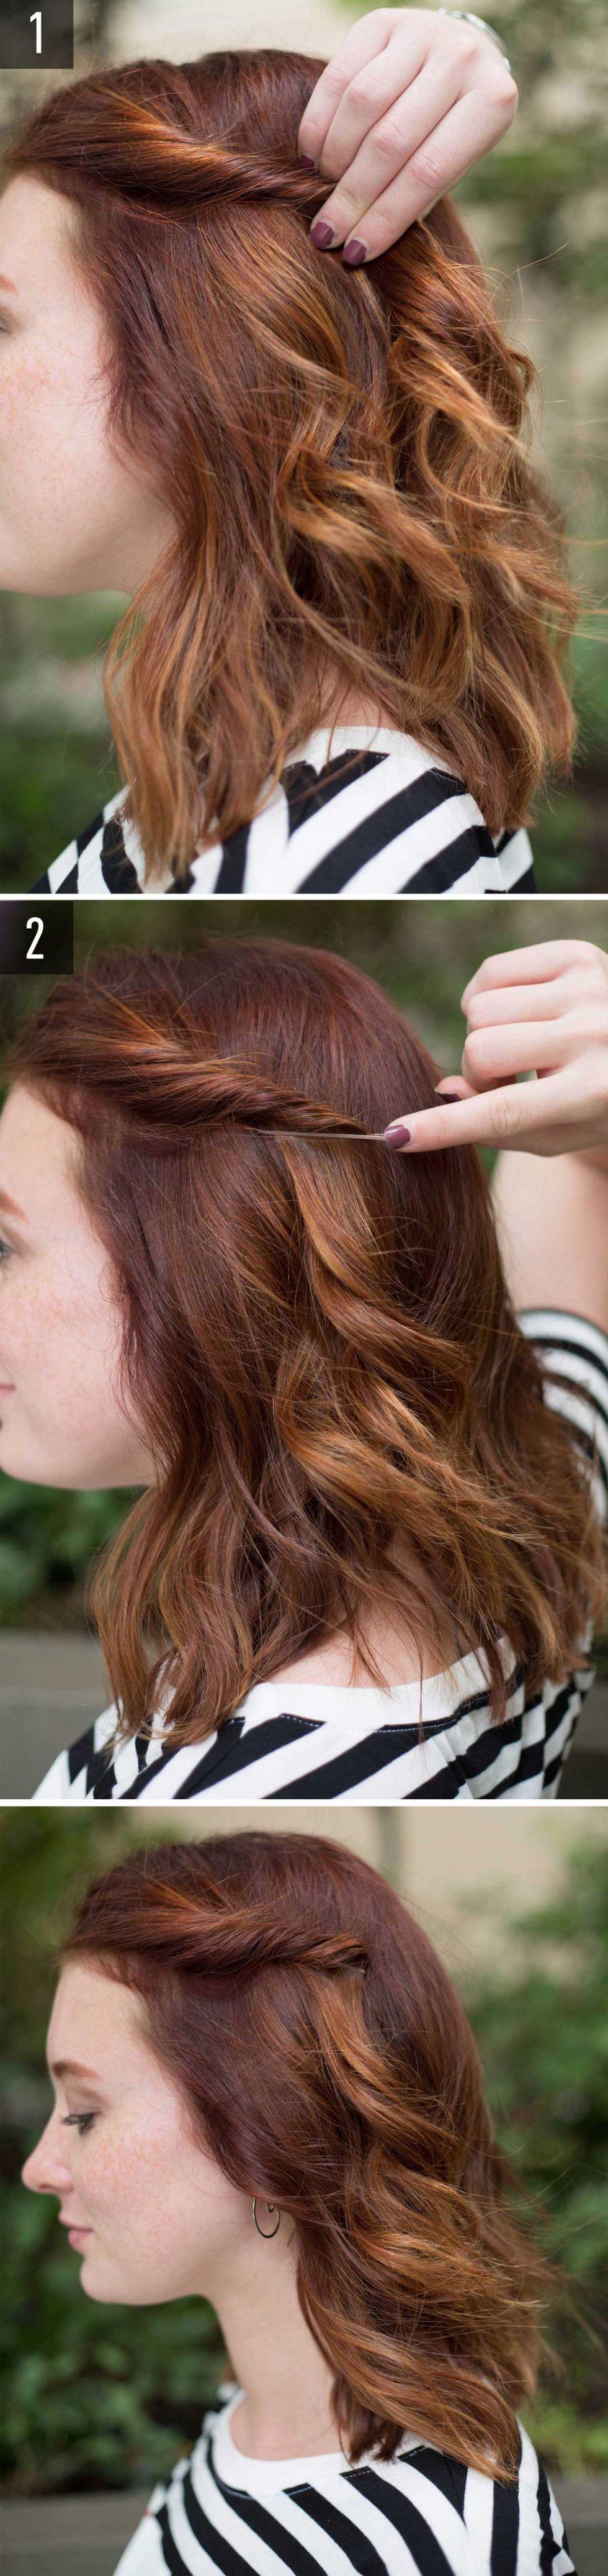 Torchon bon ton wavy bobs pinterest hair style hair dos and